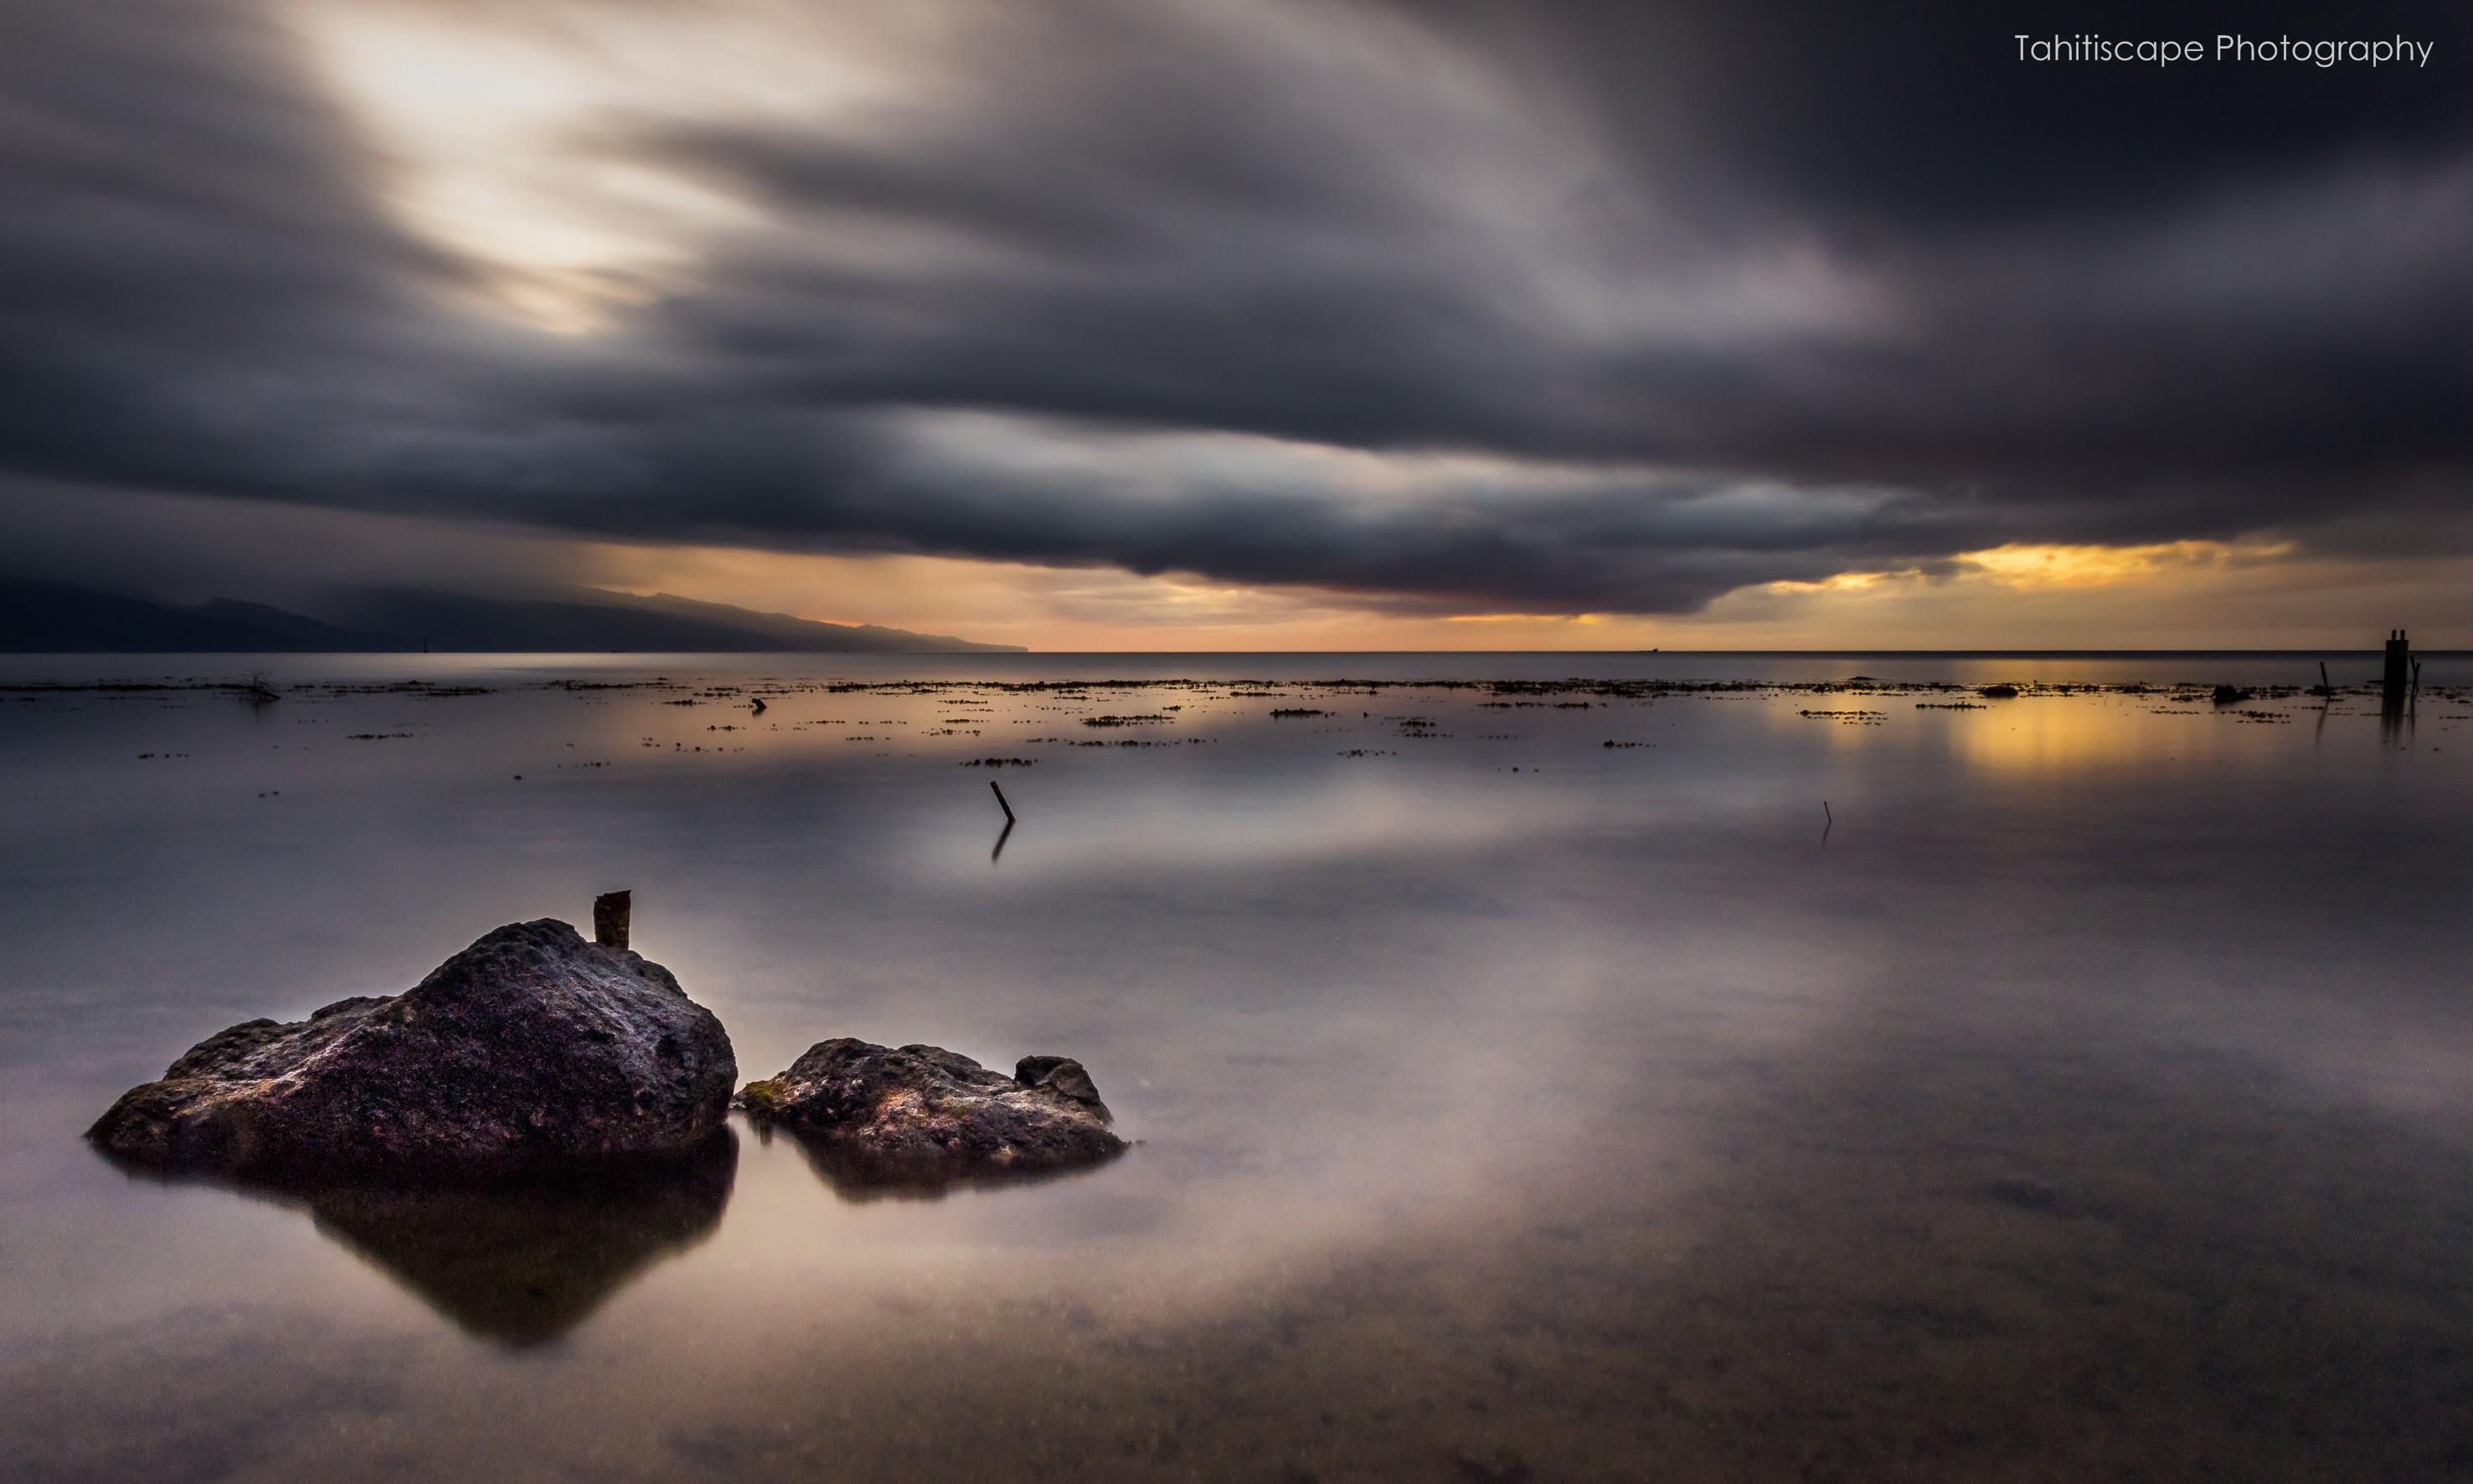 On ne voyait plus qu'un océan lisse (Tahiti, février 2016) Photo: Steve Kuo